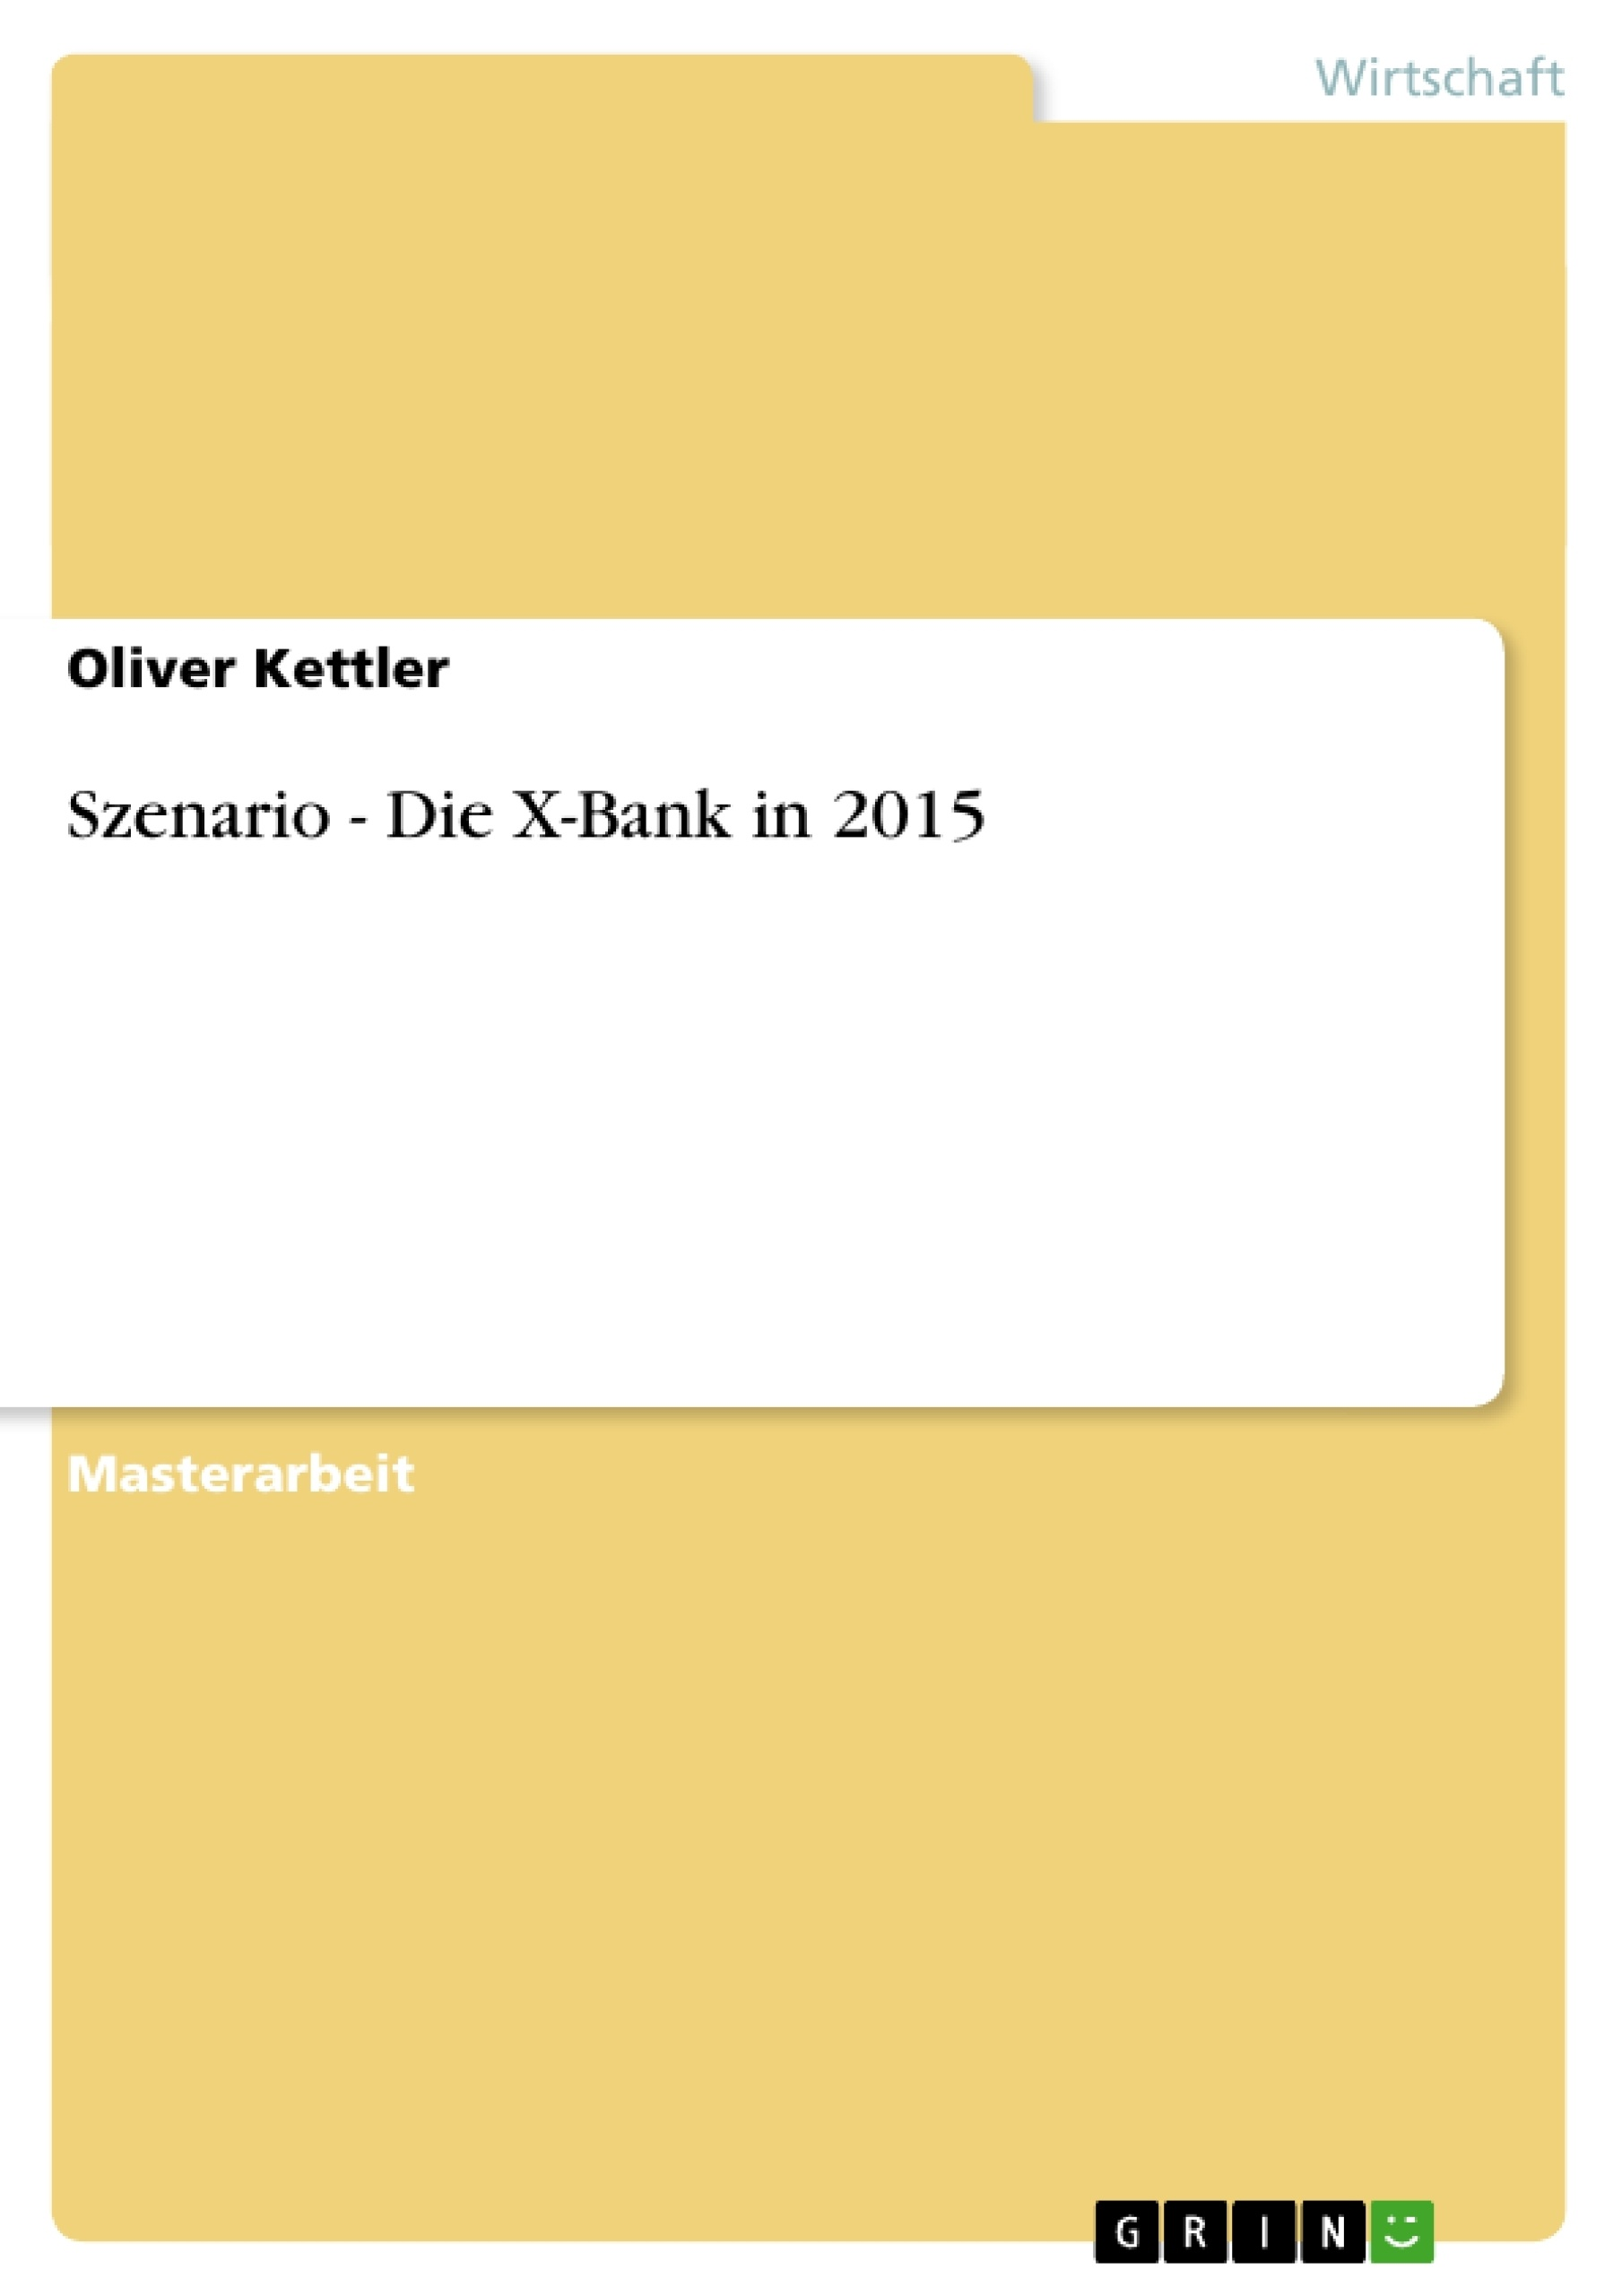 Titel: Szenario - Die X-Bank in 2015